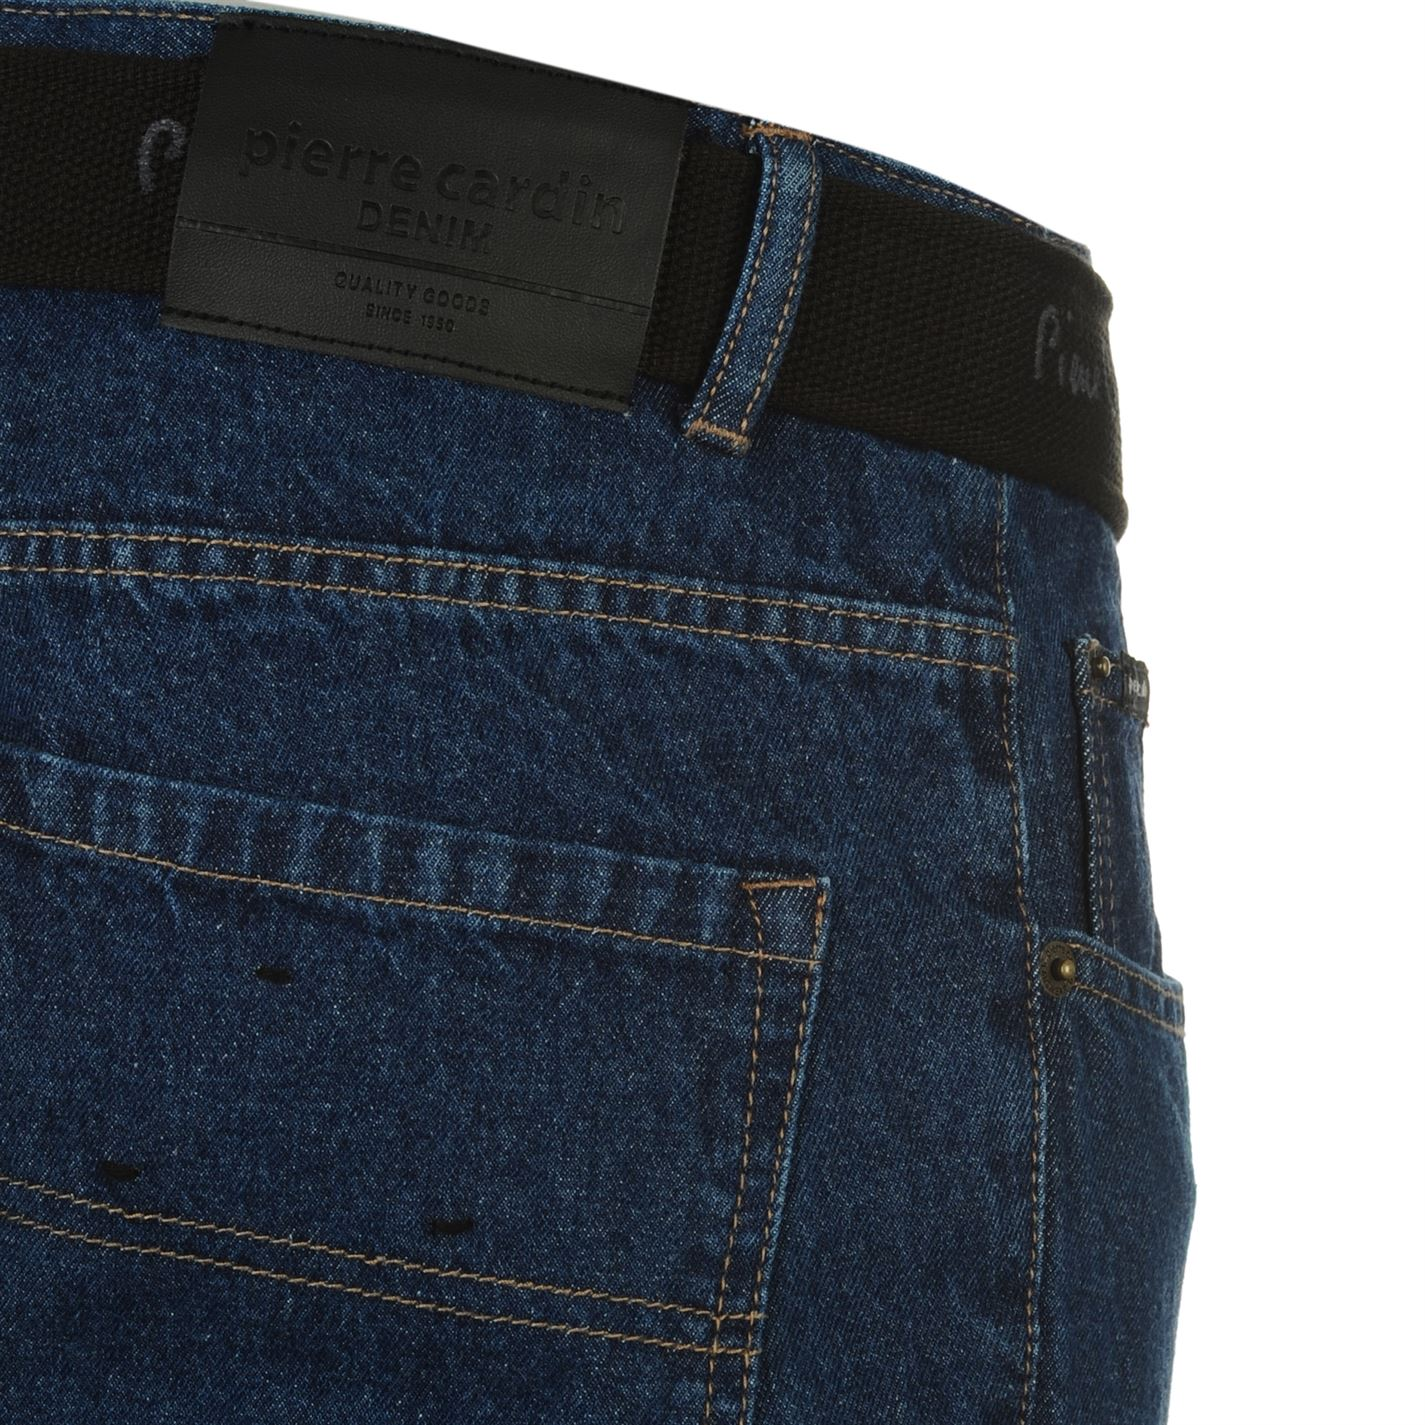 Pierre Cardin Gents Mens Web Belt Jeans Straight Fit Denim Trousers Long Pants